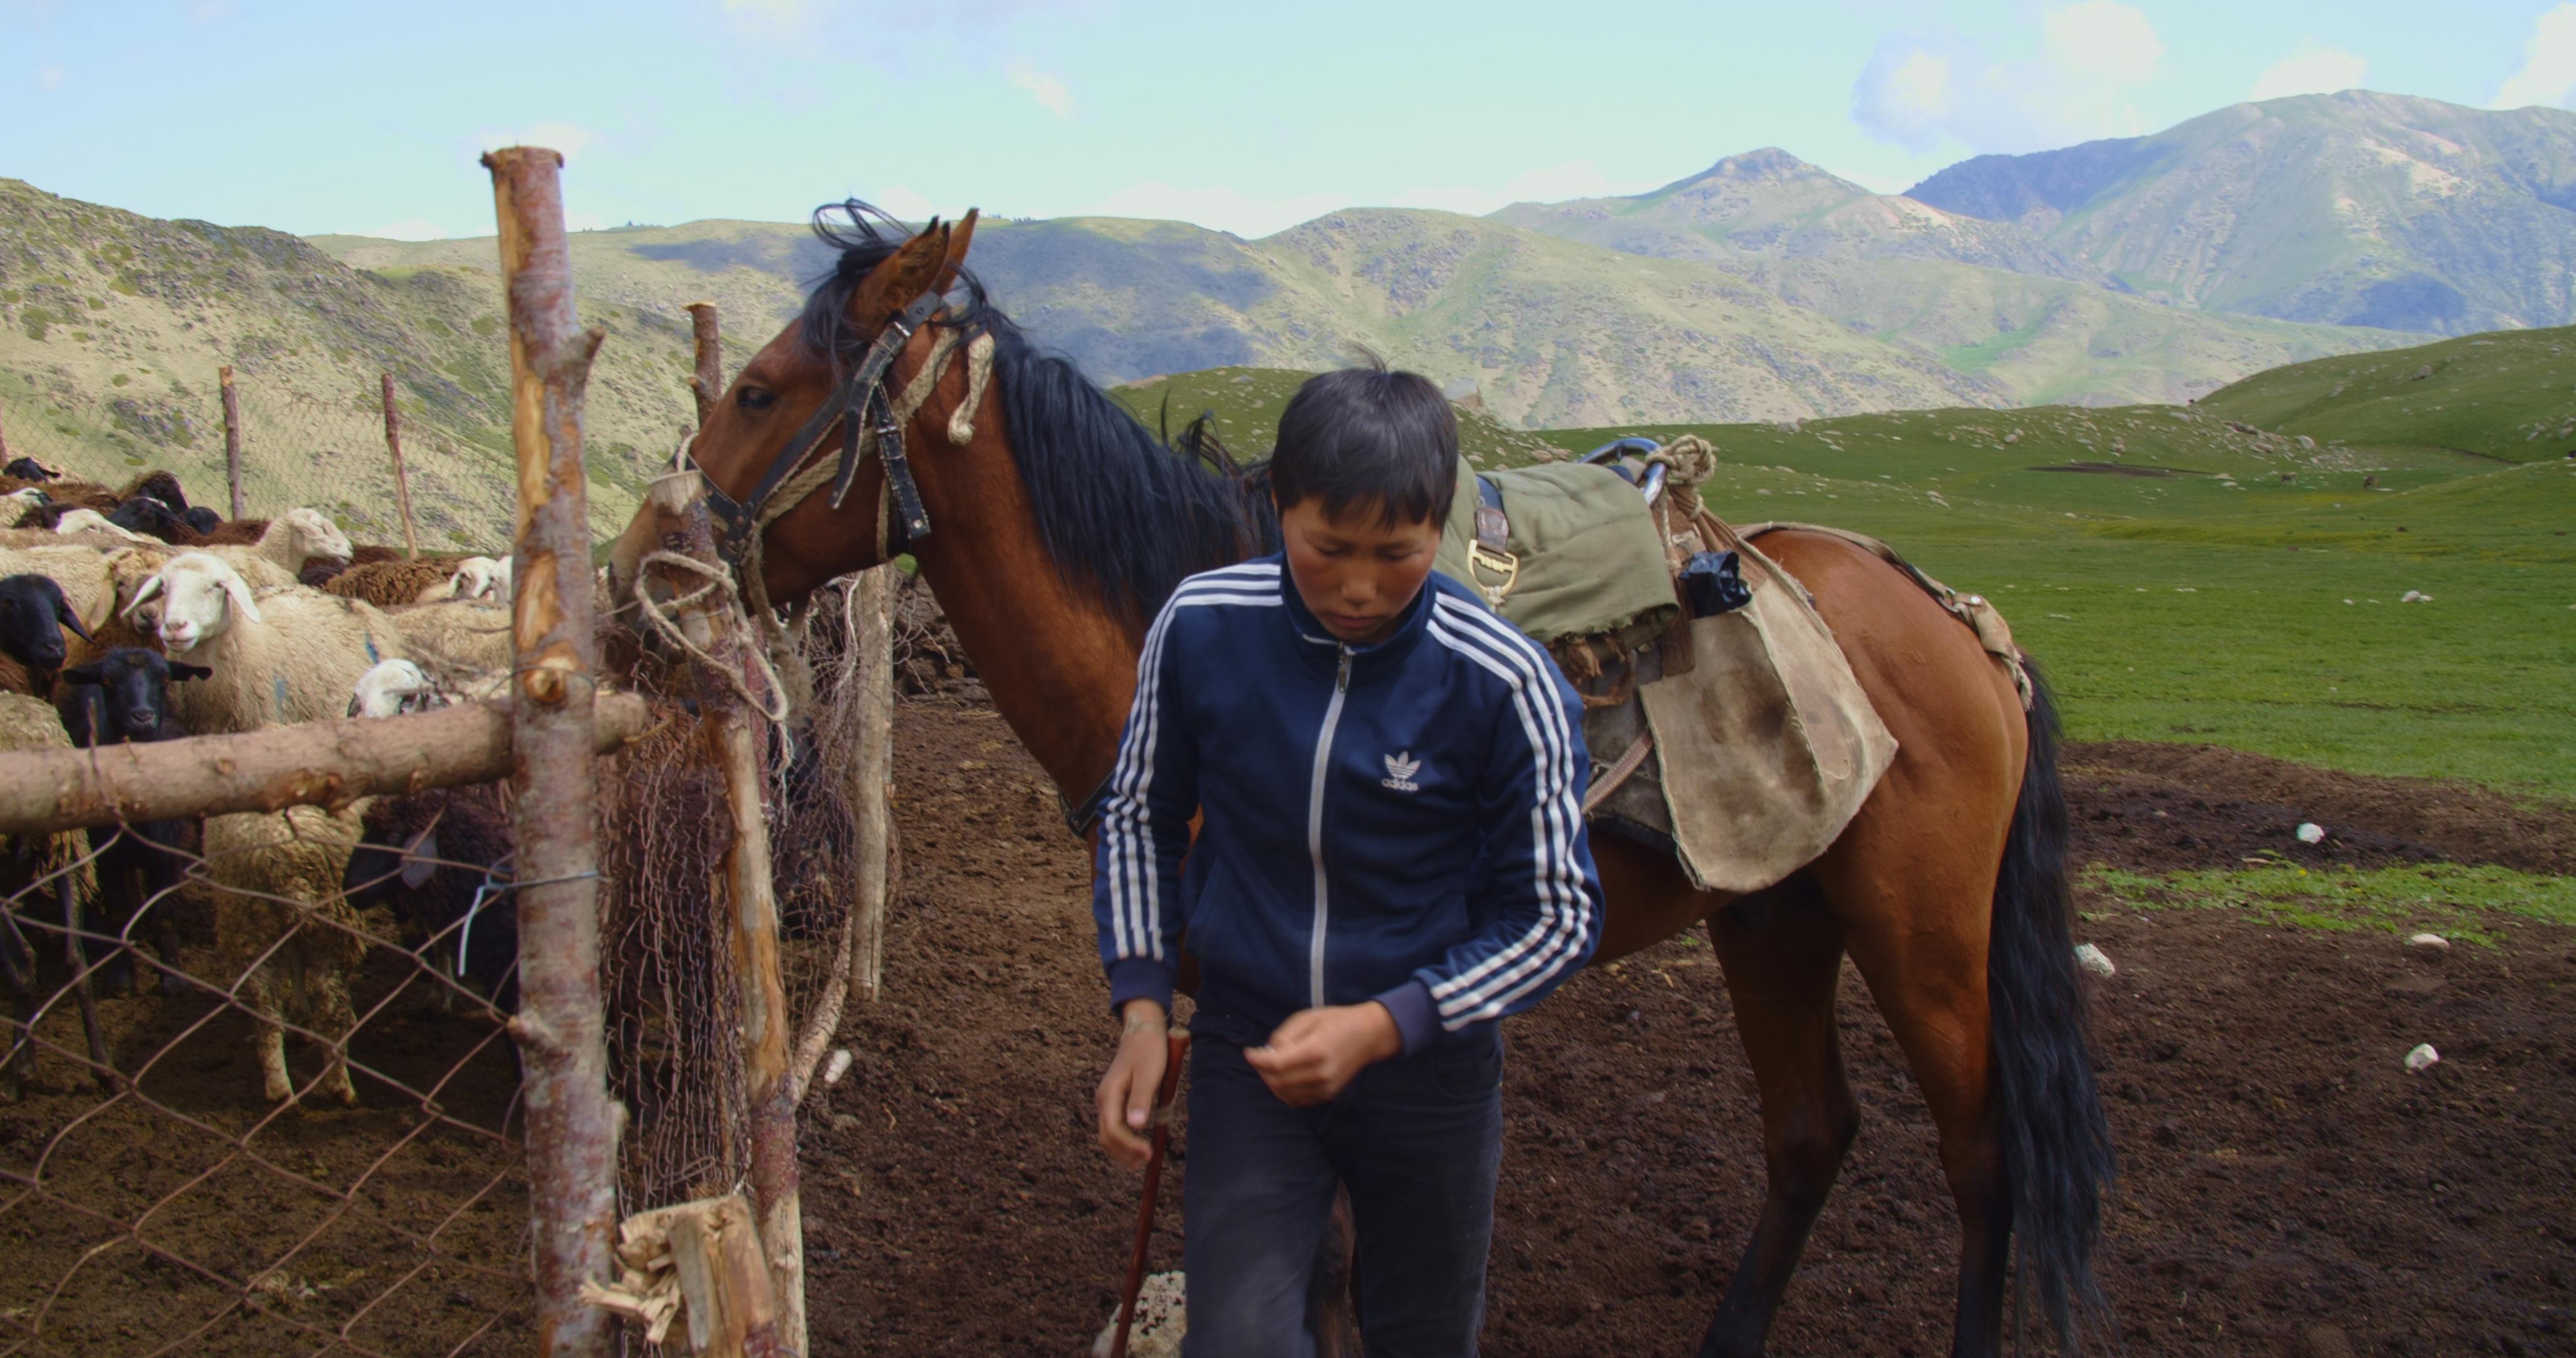 TheBoyFromKyrgyzstan_Stills_1.34.1